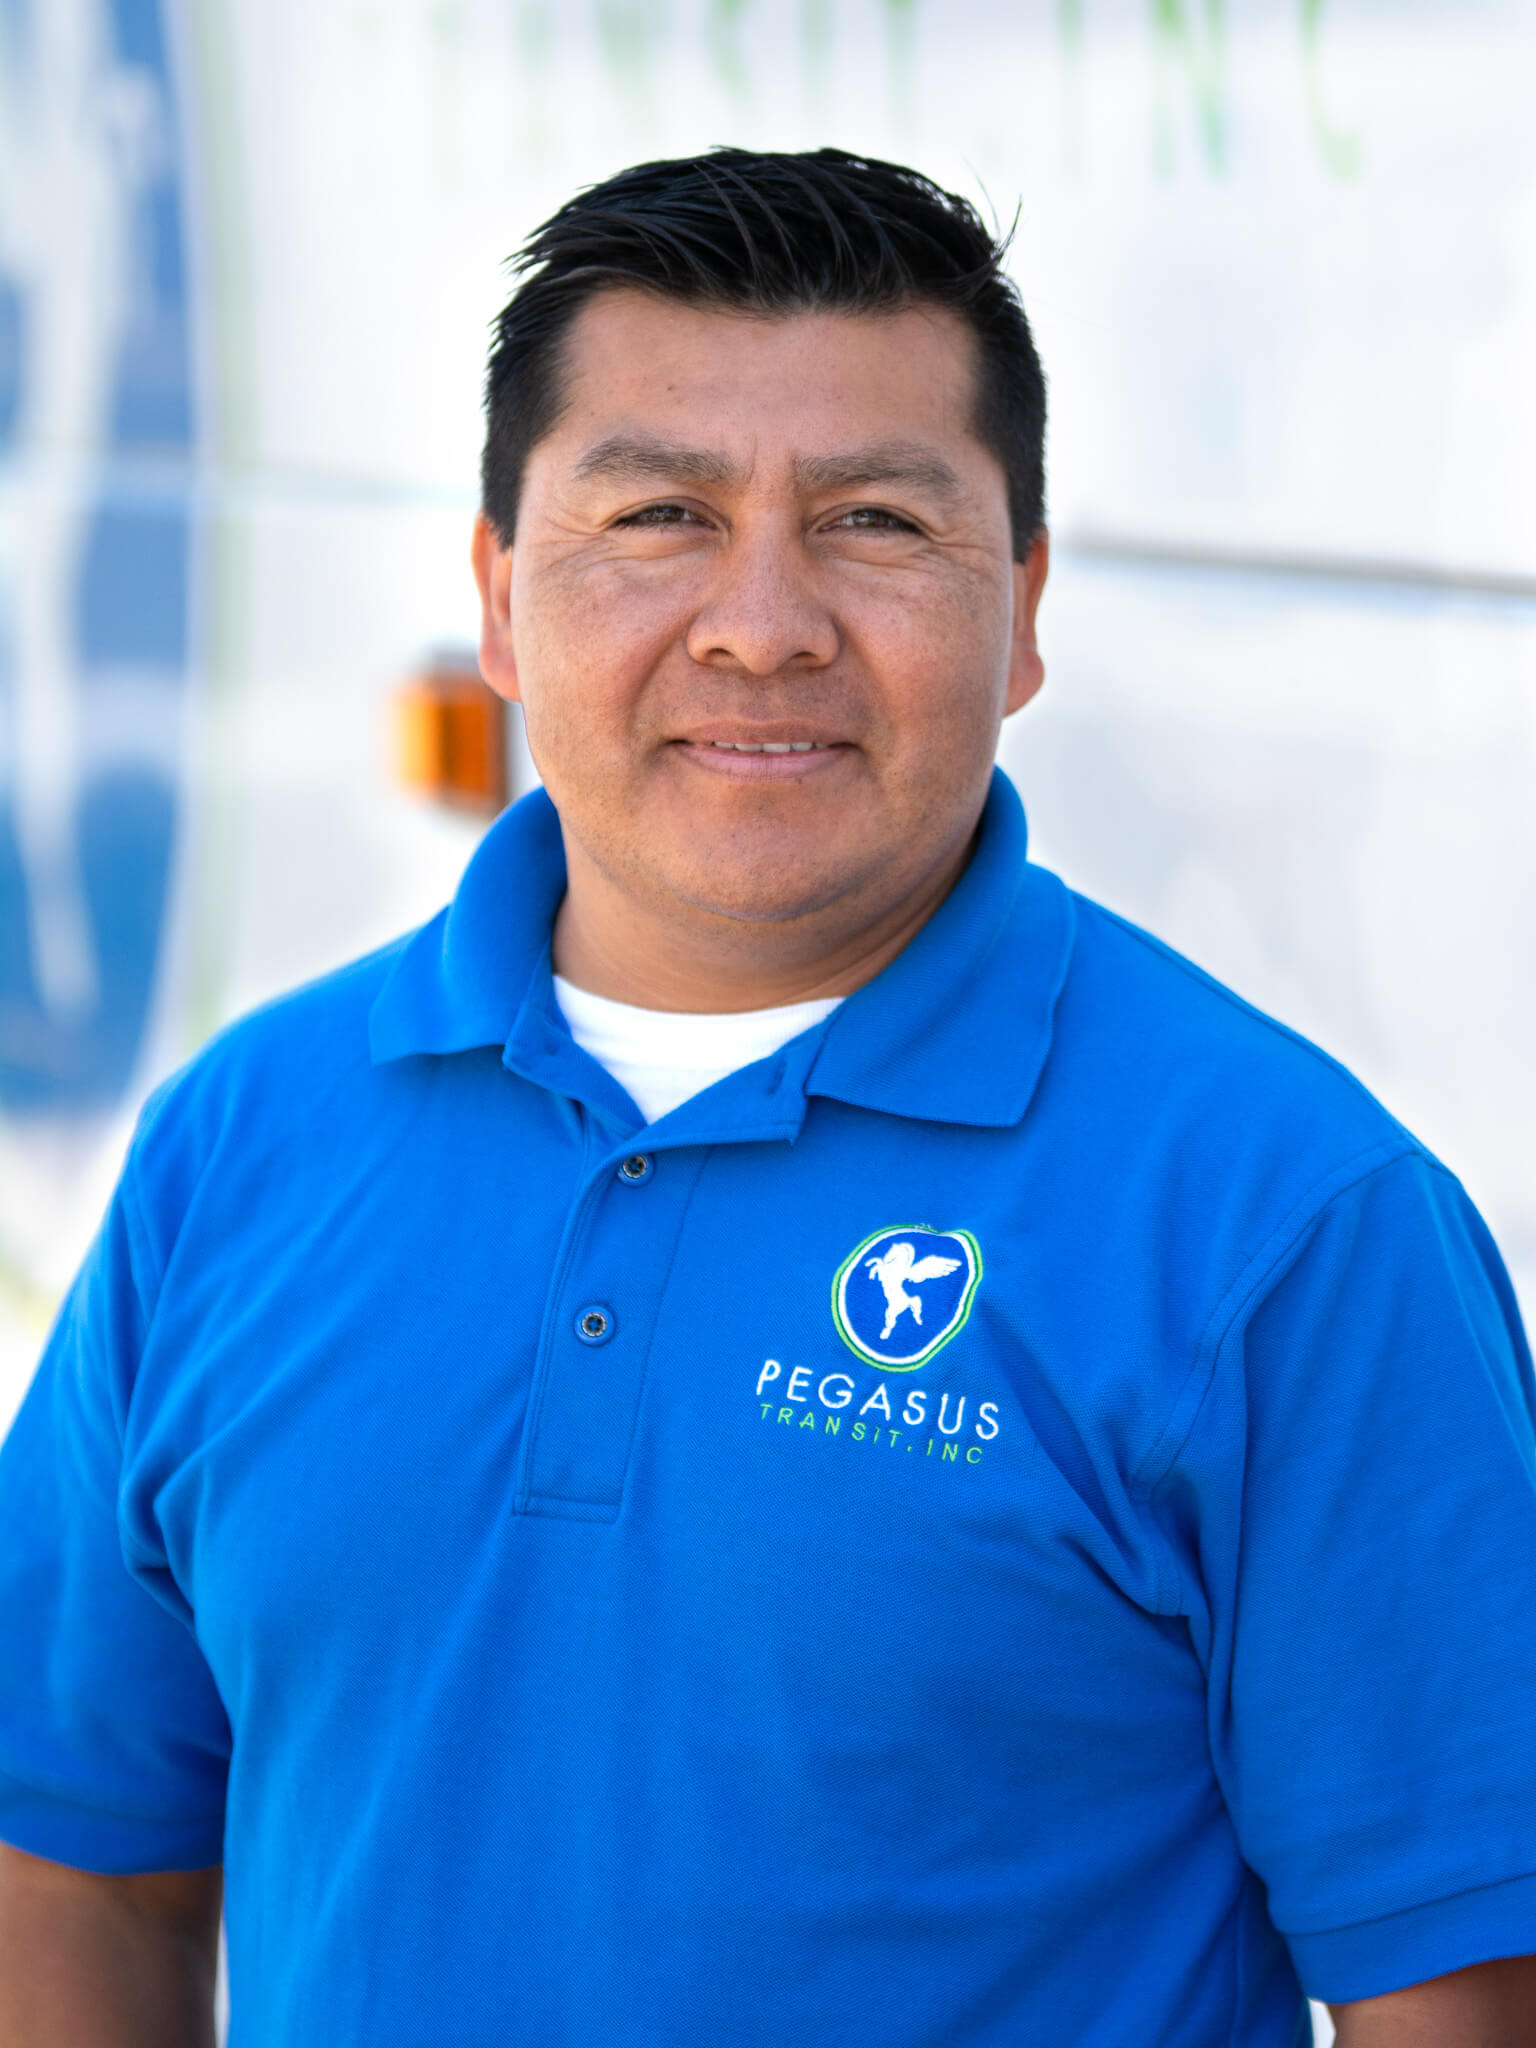 Portrait of one of Pegasus Transit's bus drivers.